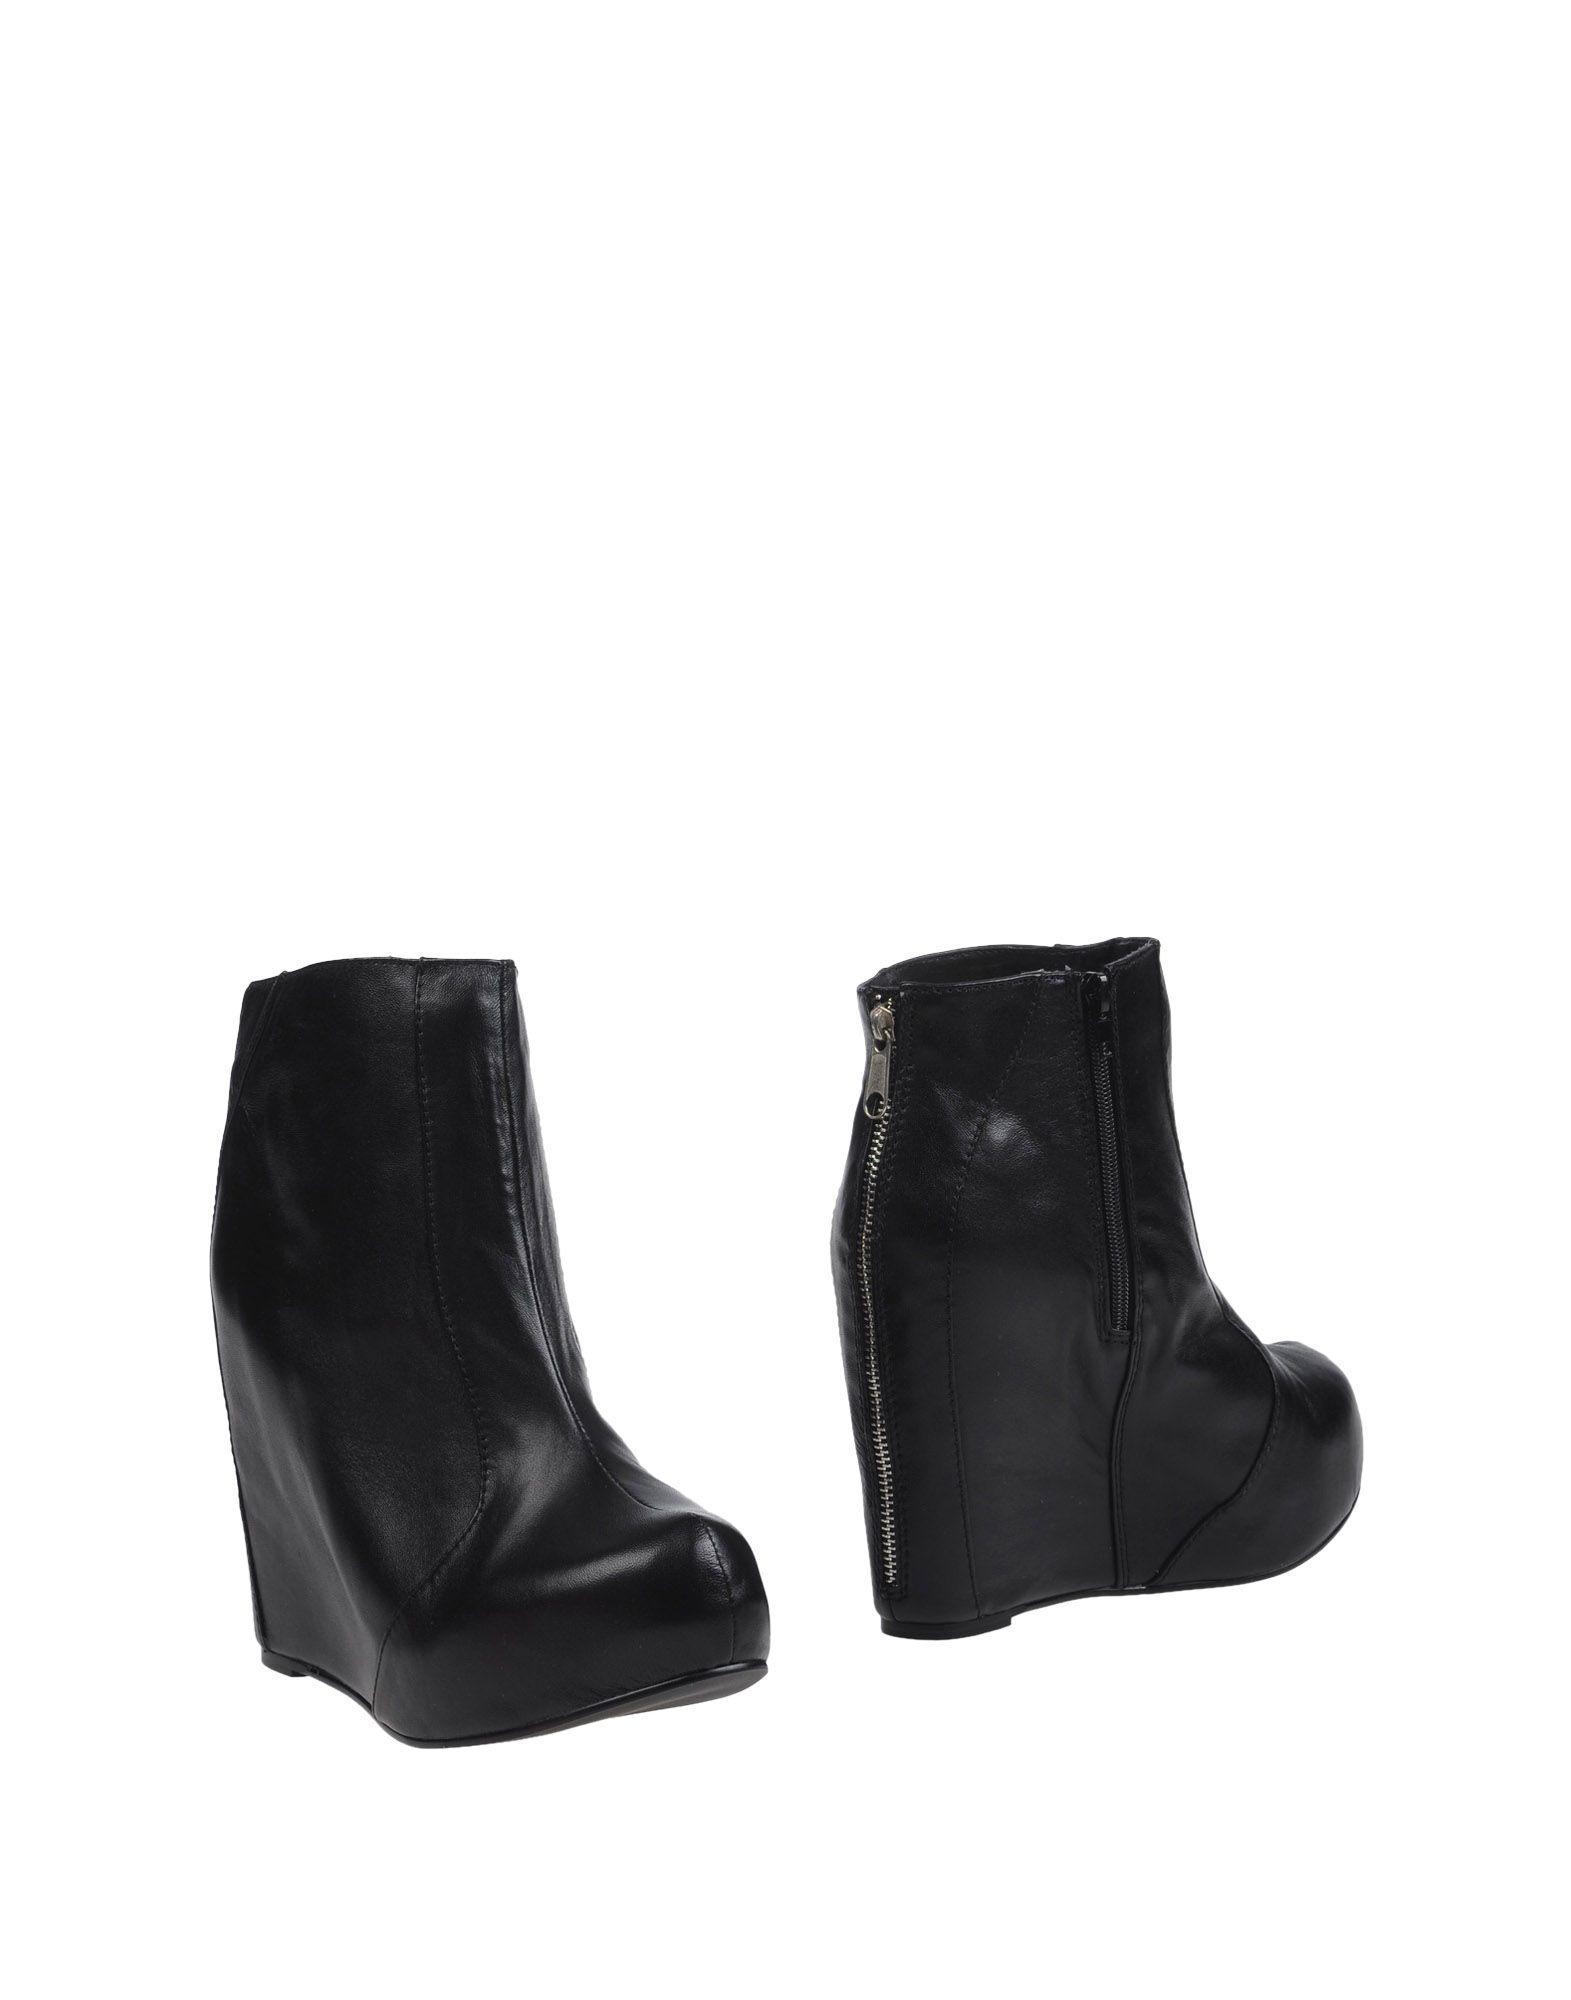 Jeffrey Campbell Stiefelette Damen  11186632XP Gute Qualität beliebte Schuhe